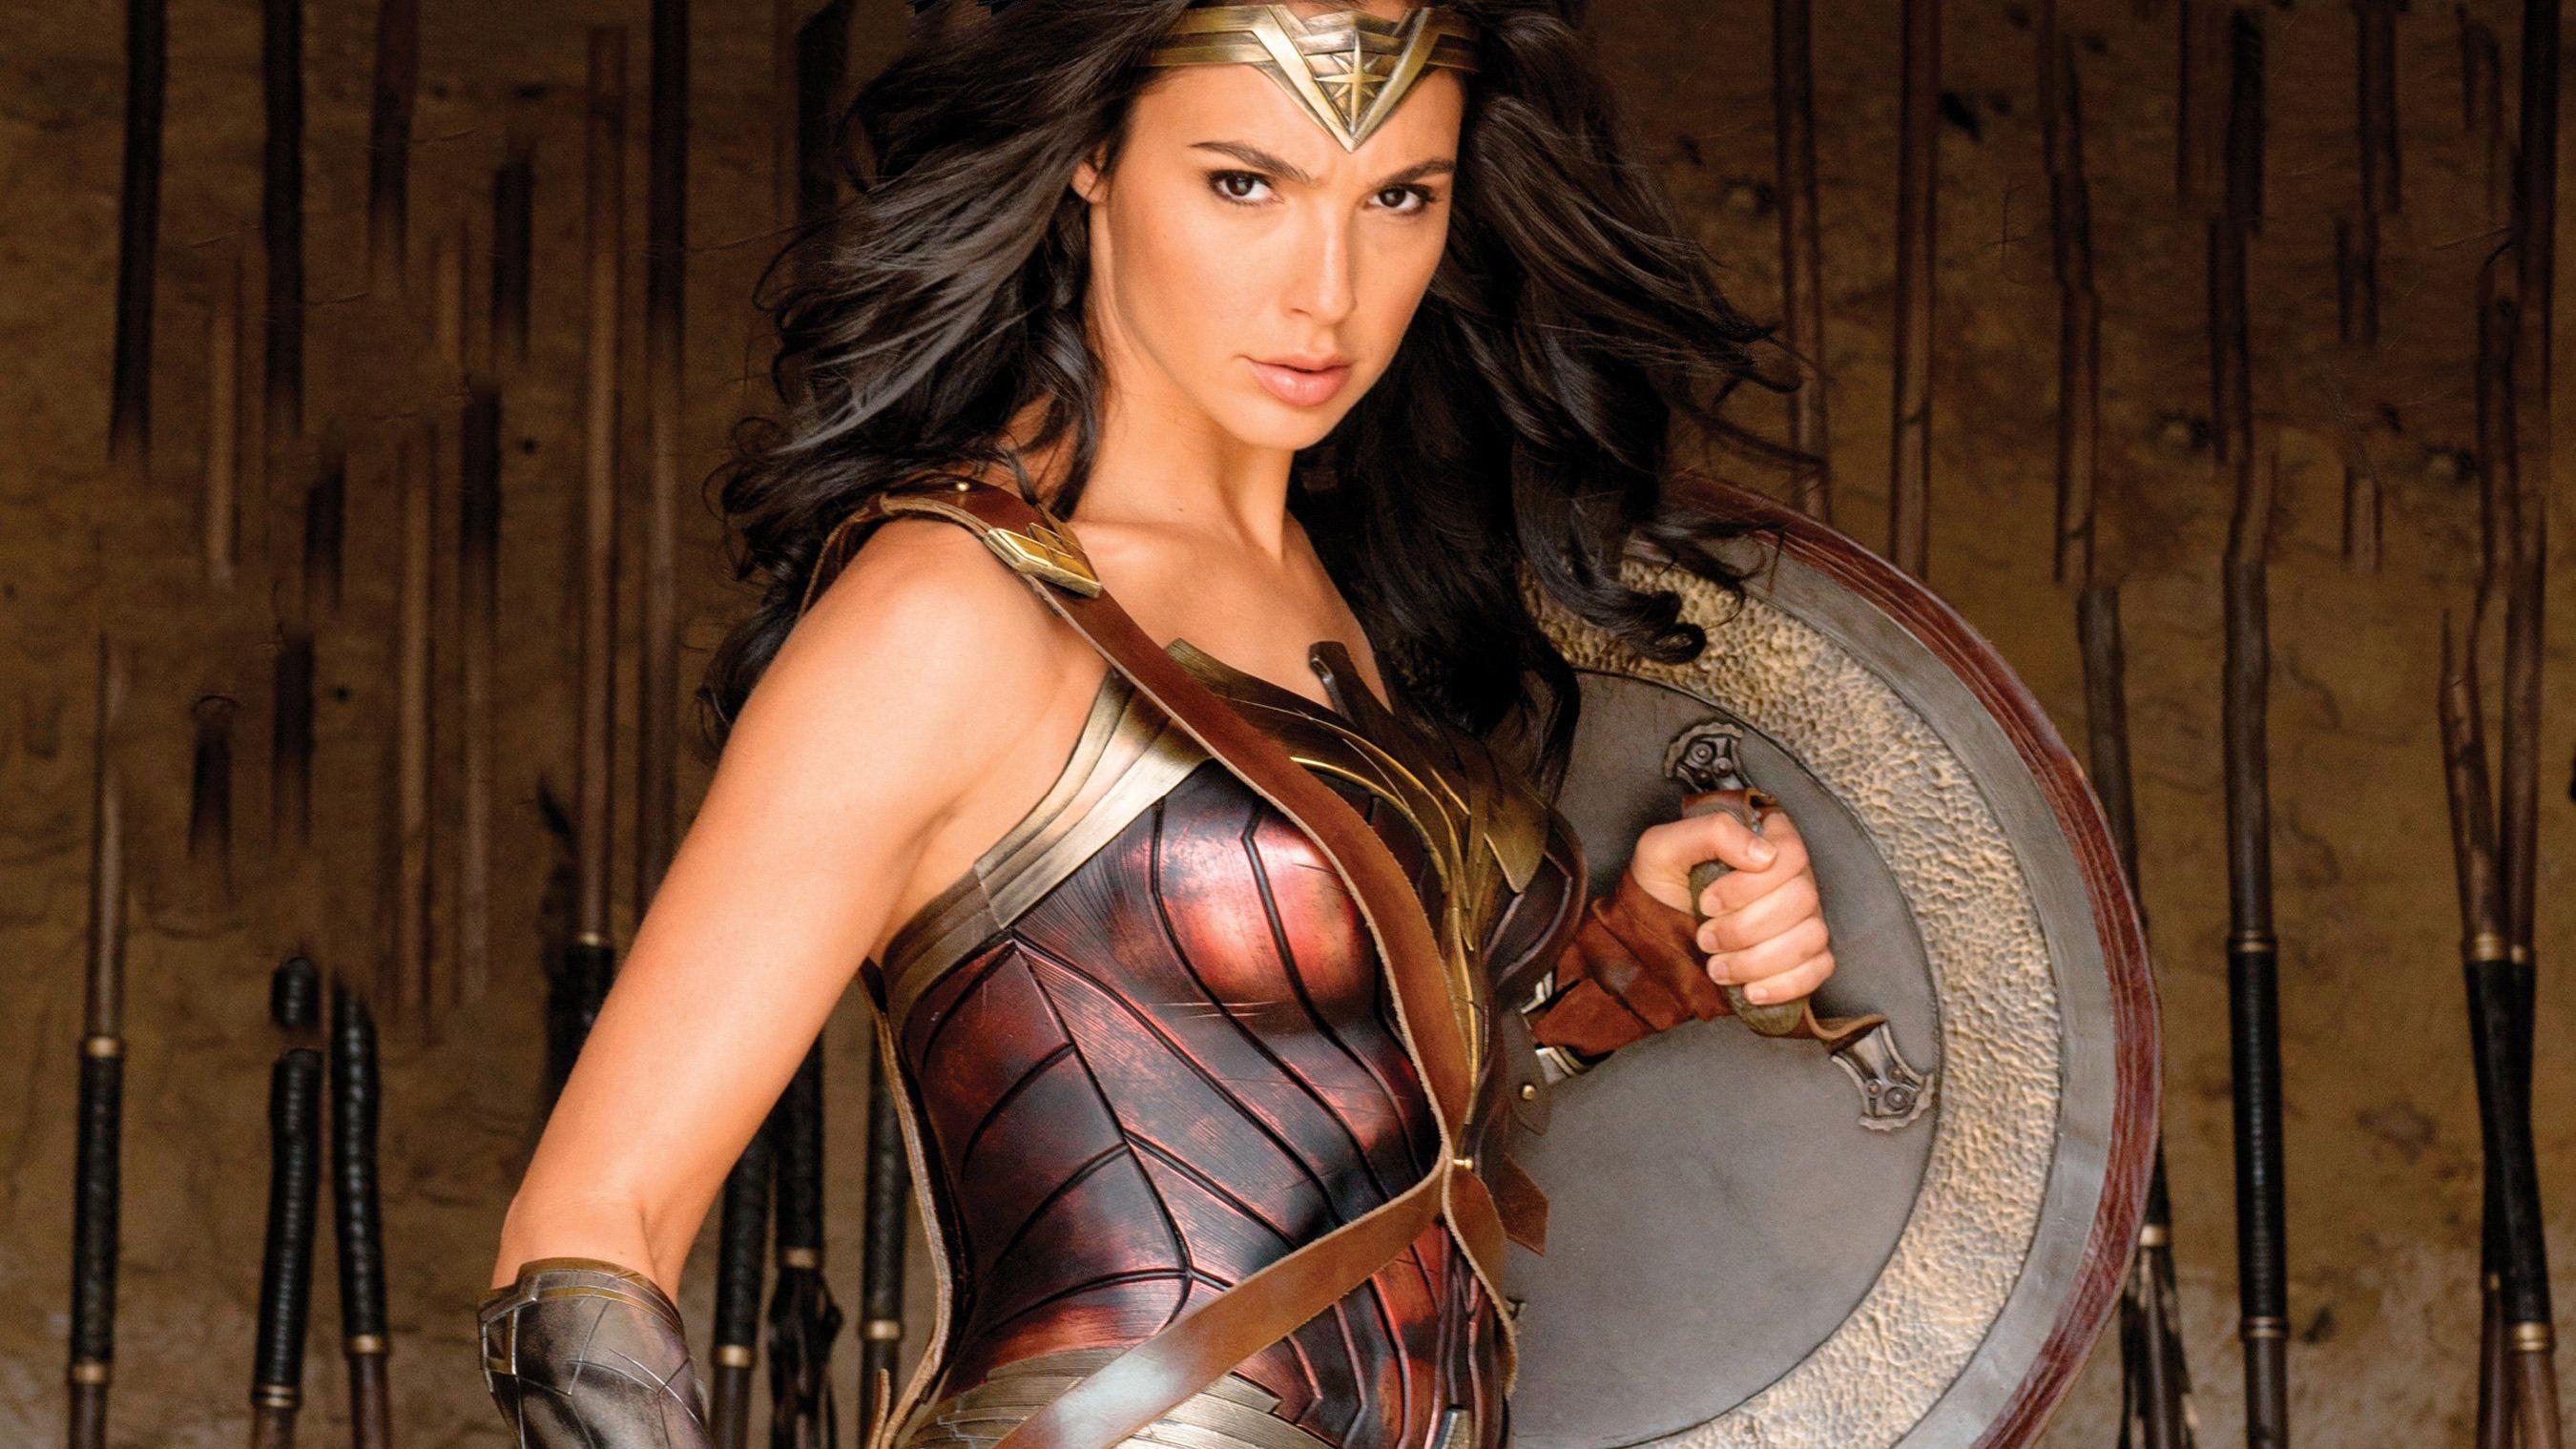 Wallpaper Wonder Woman Hd 4k 8k Movies 9526: Wonder Woman With Shield, HD Movies, 4k Wallpapers, Images